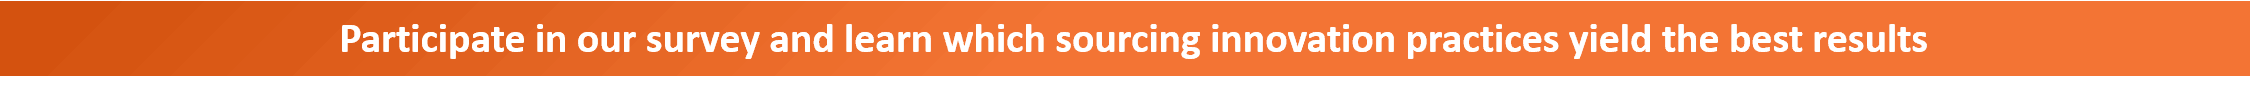 orange block with white text